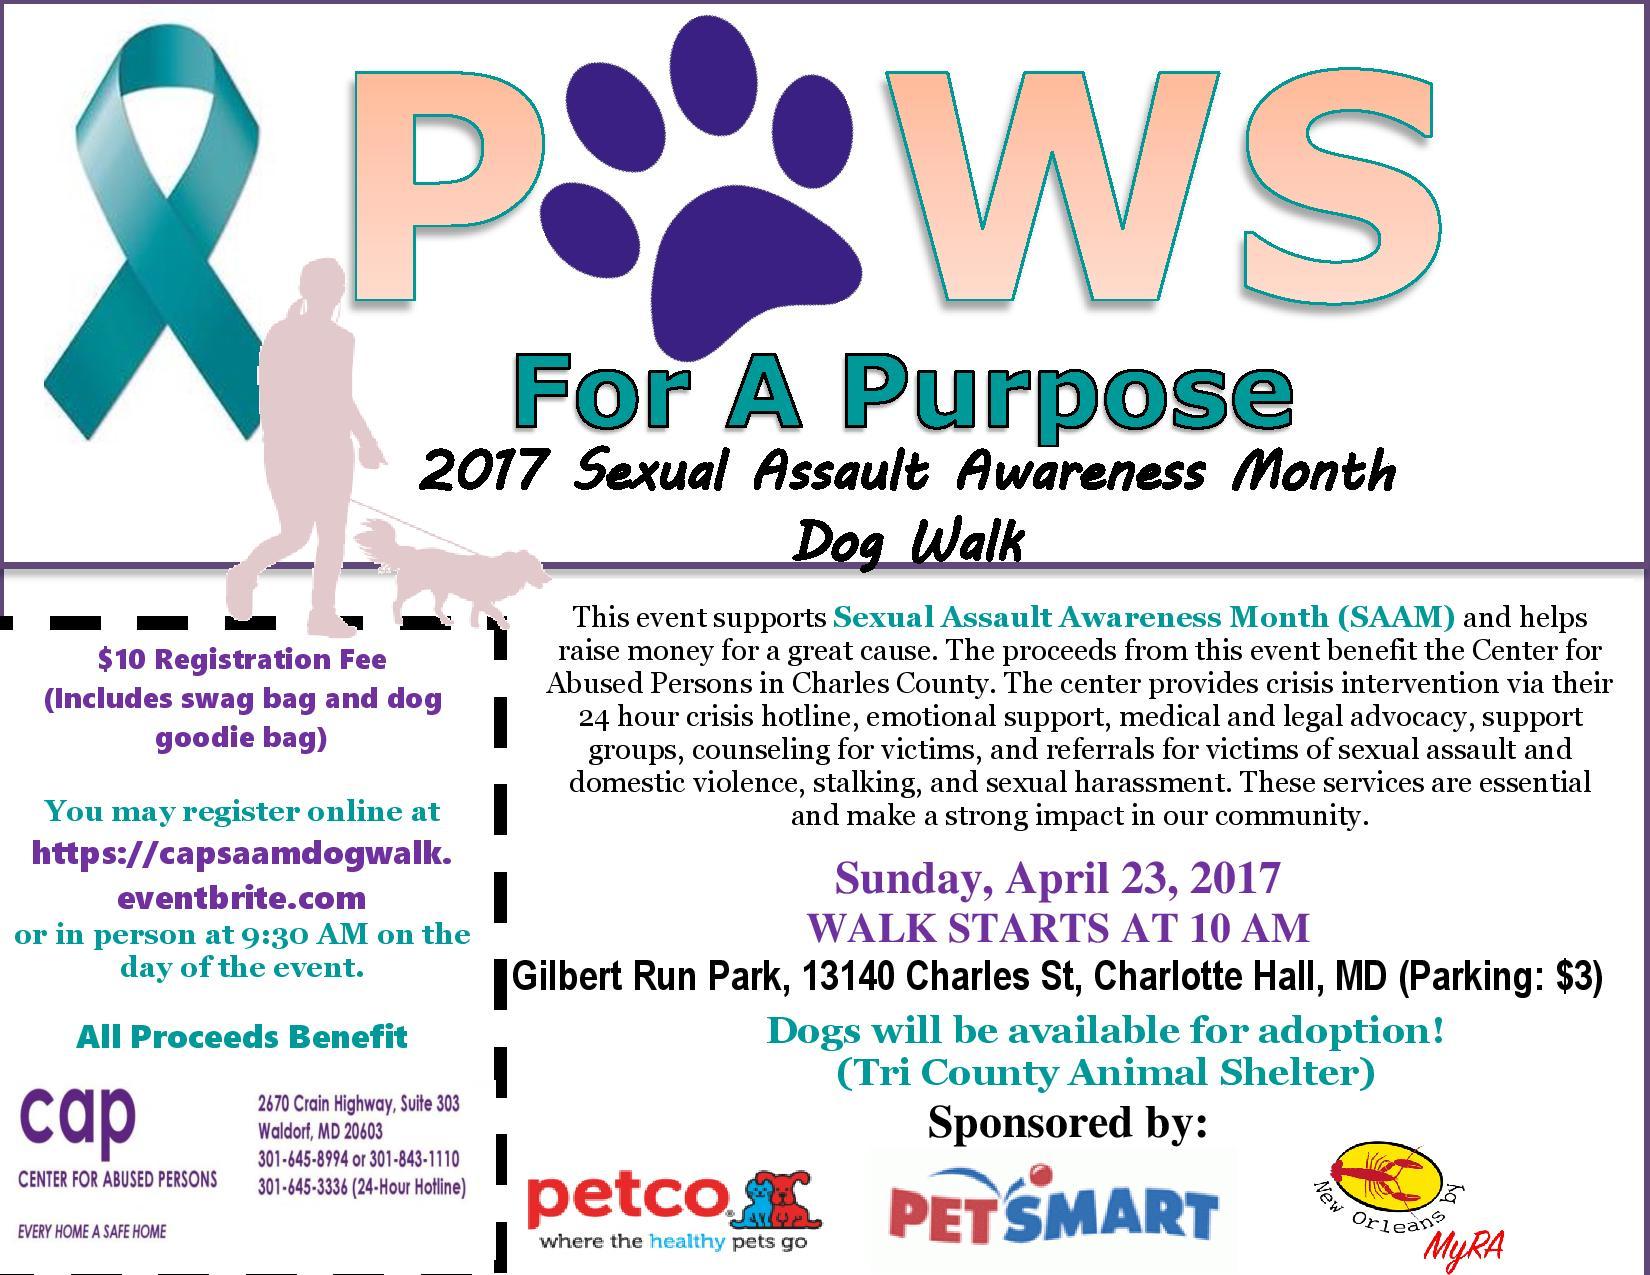 Dog Walk Event Information